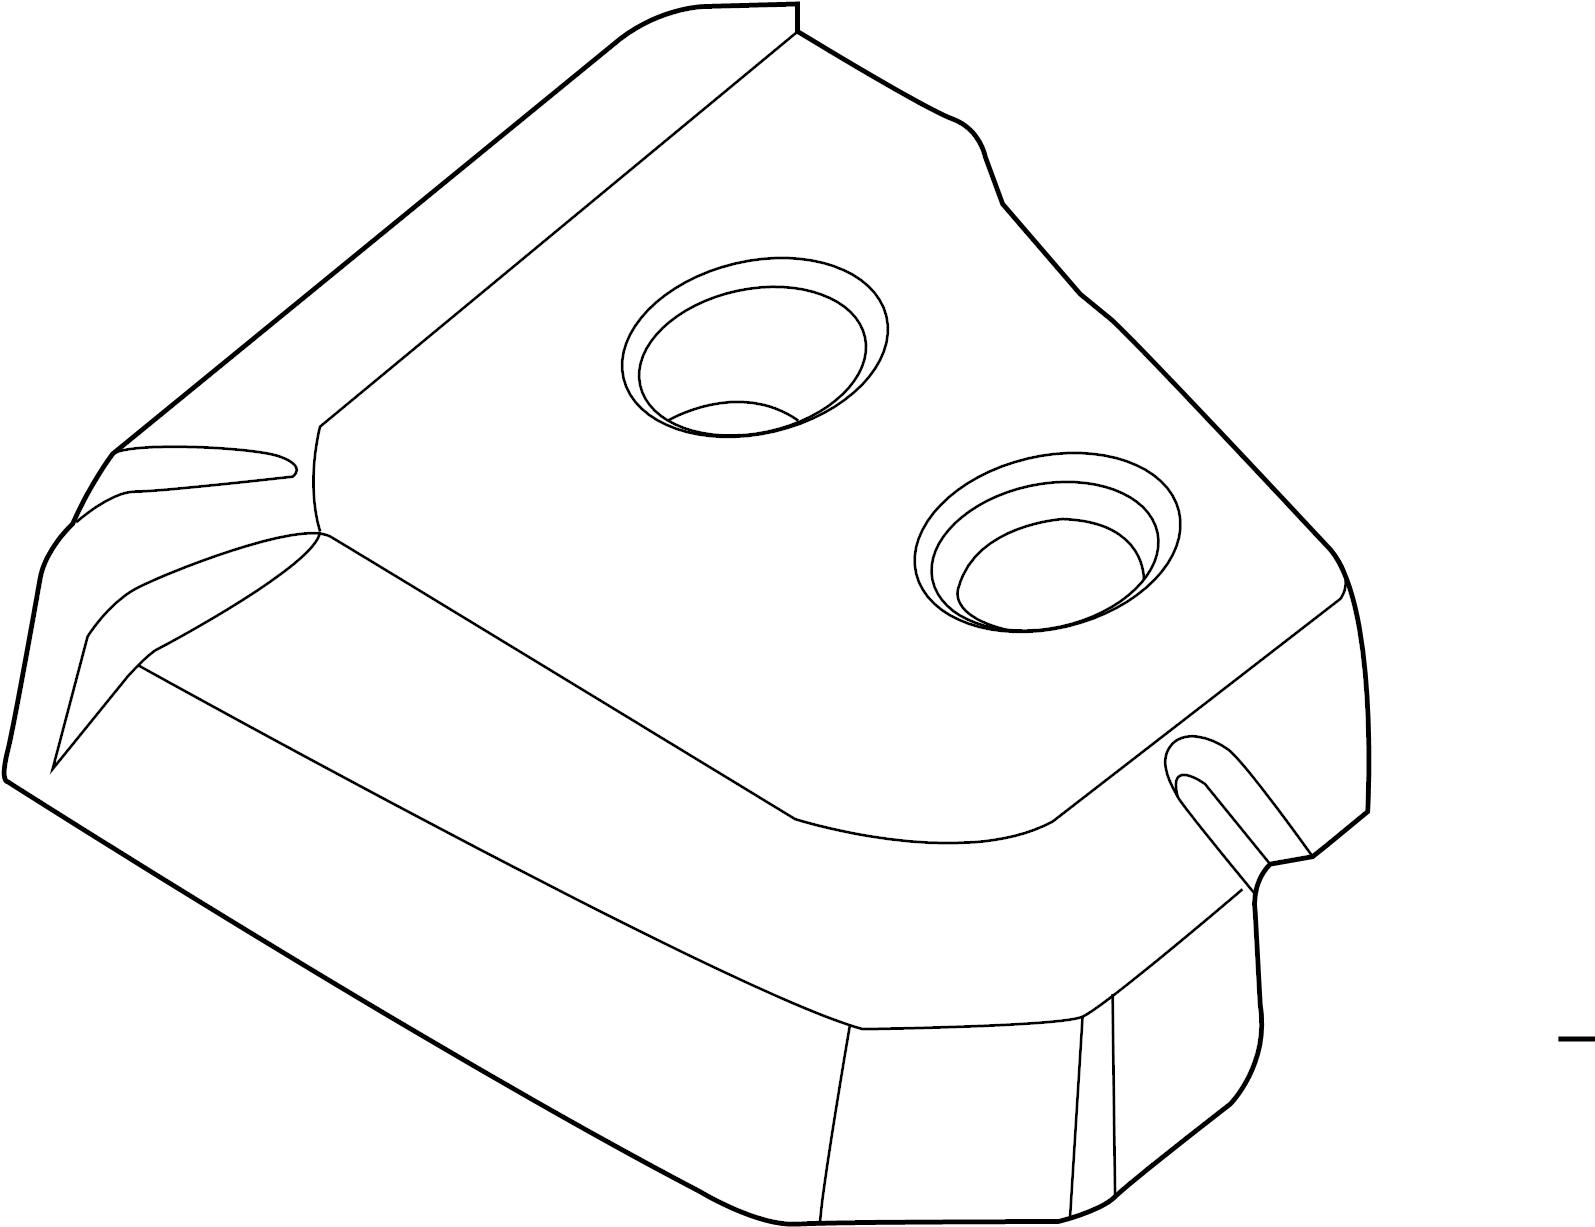 Ford Escape Engine Cover 2 0 Liter Transaxle